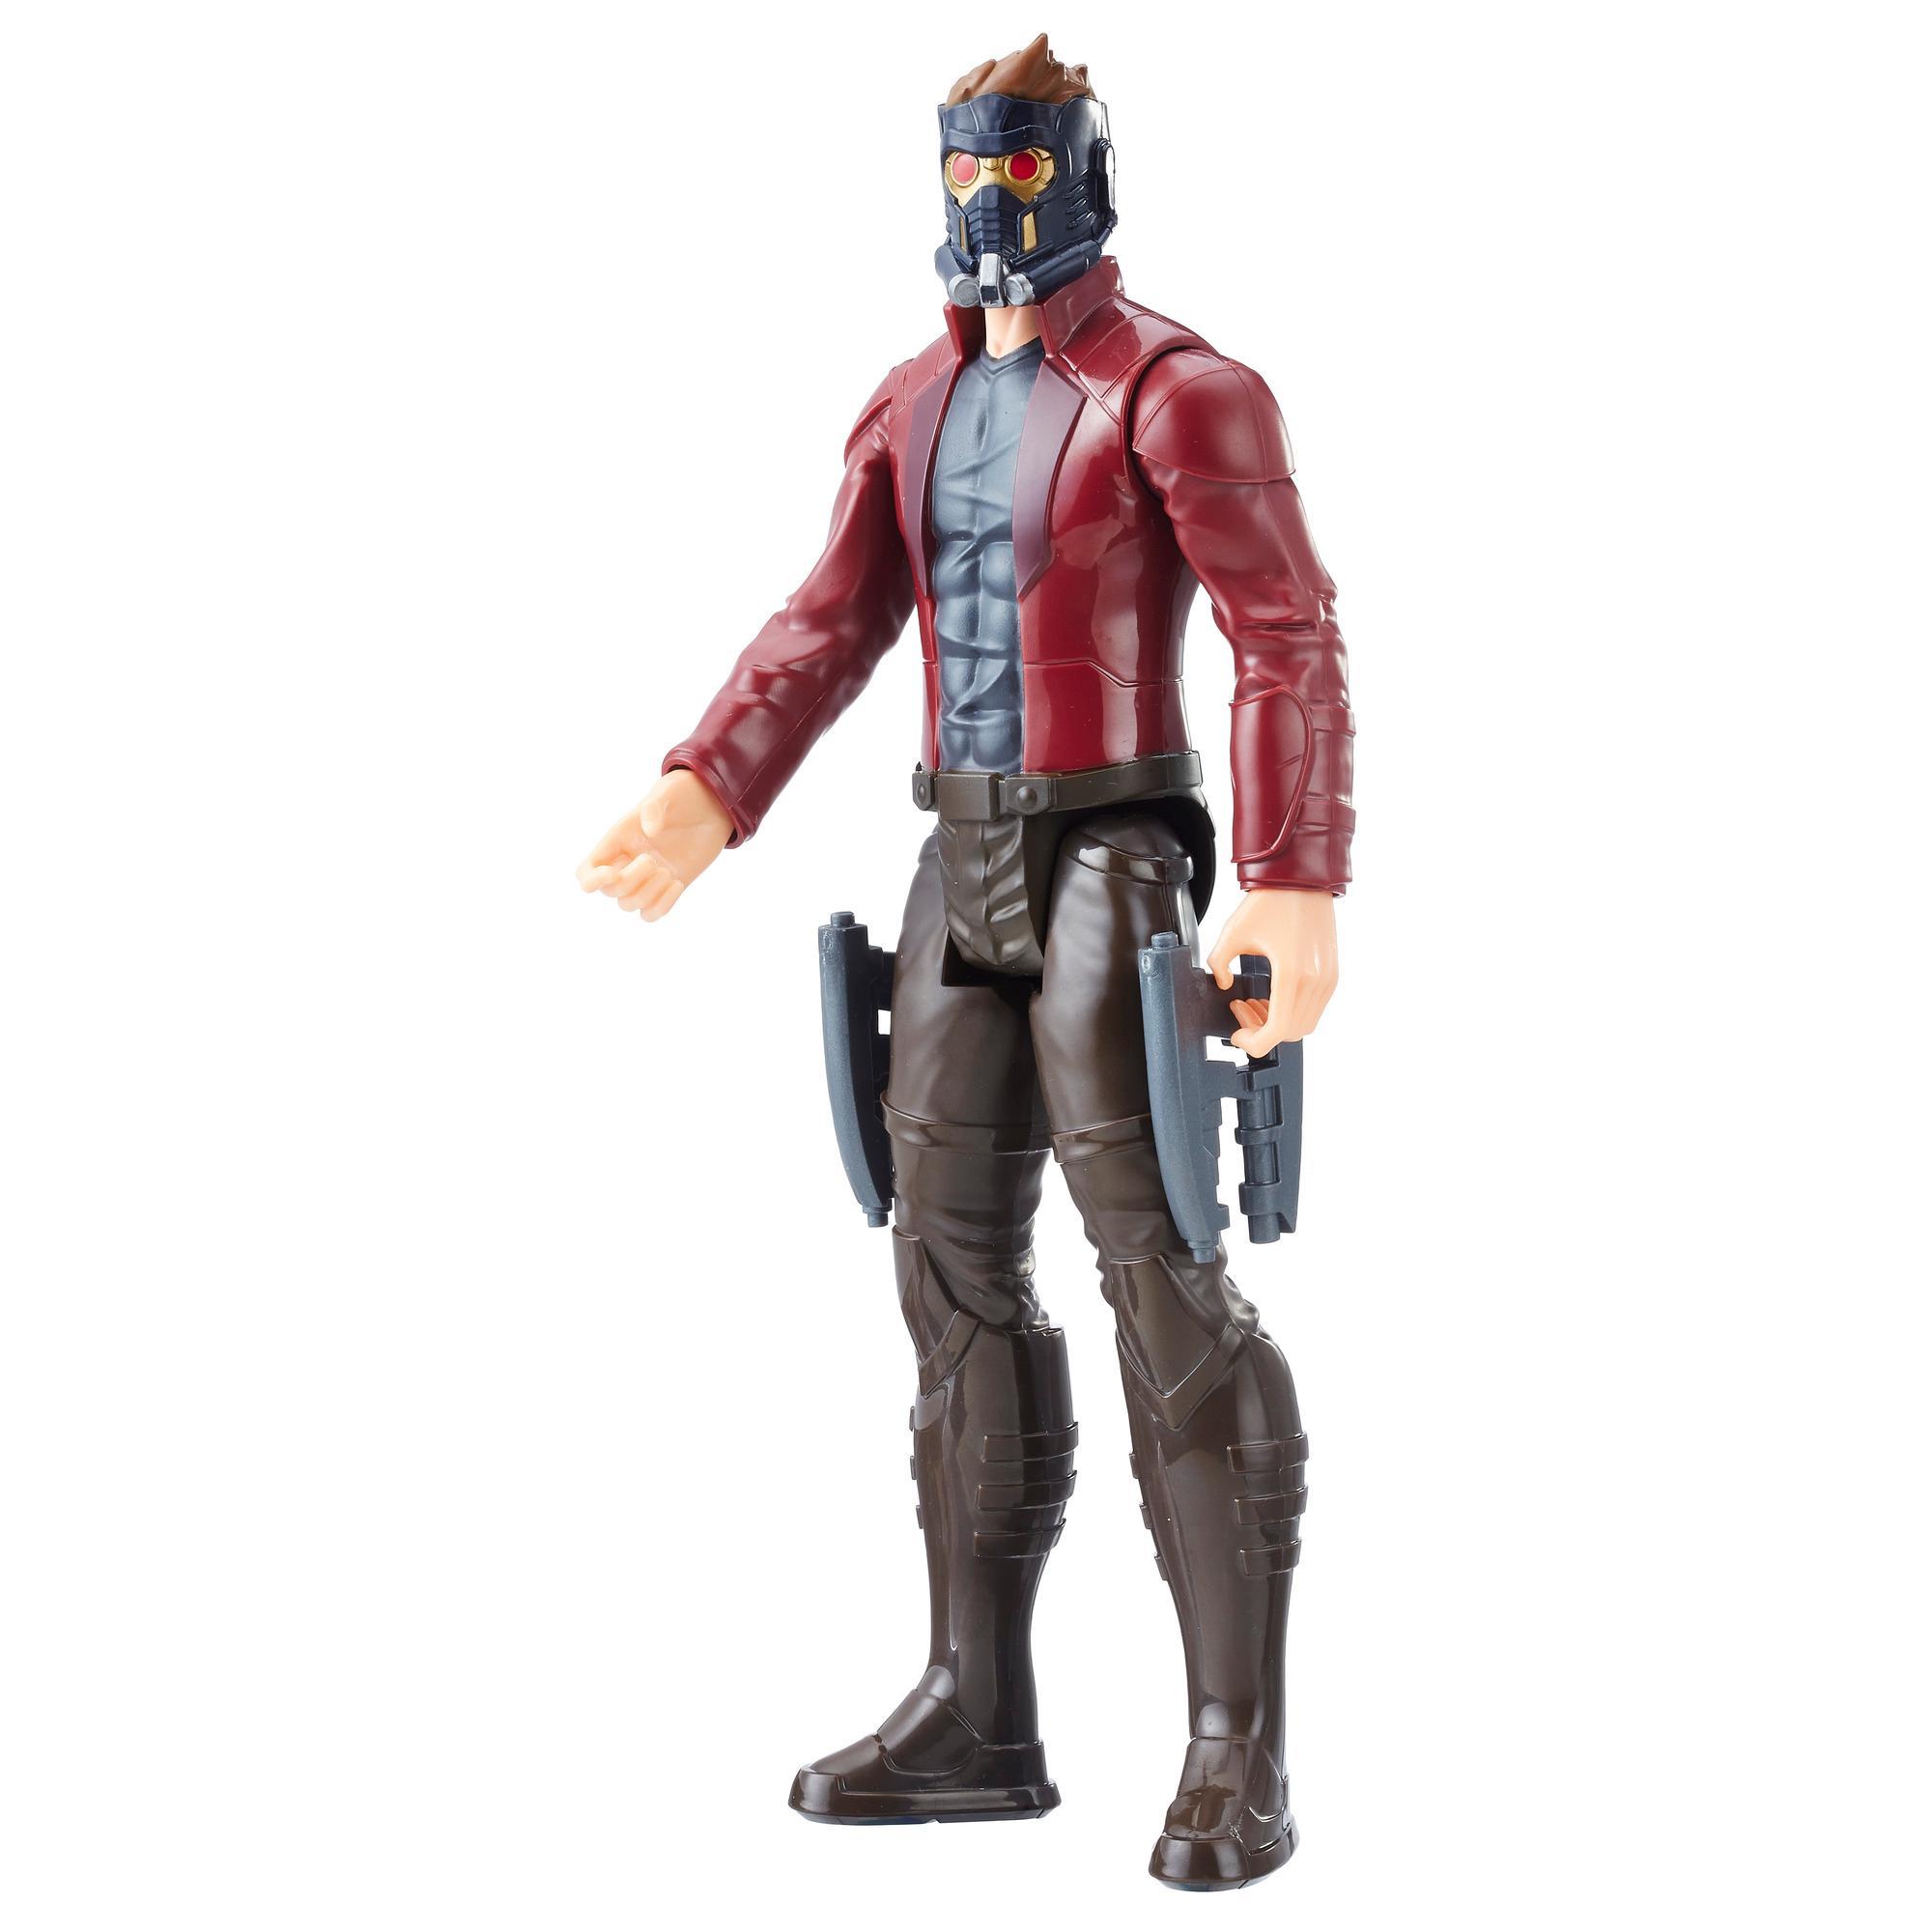 Marvel Infinity War Titan Hero Series - Star-Lord con puerto para Titan Hero Power FX